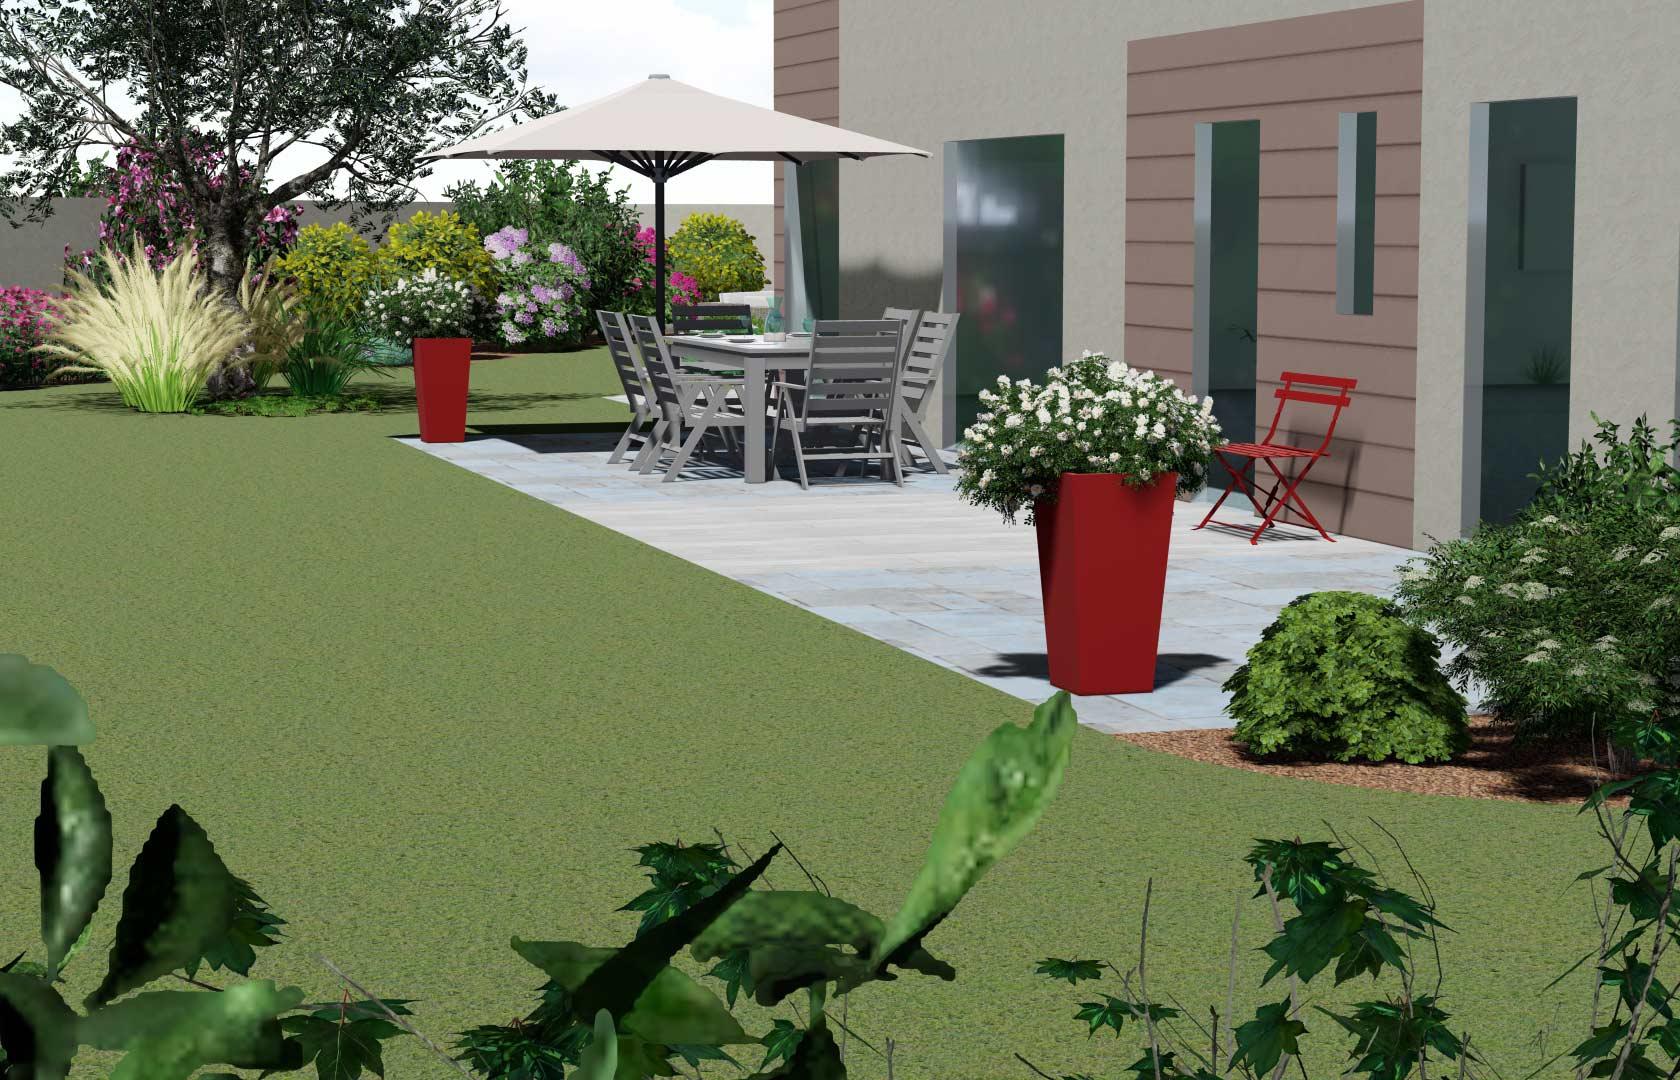 Serrault Jardins, entreprise du paysage, imagine votre terrasse en bois.